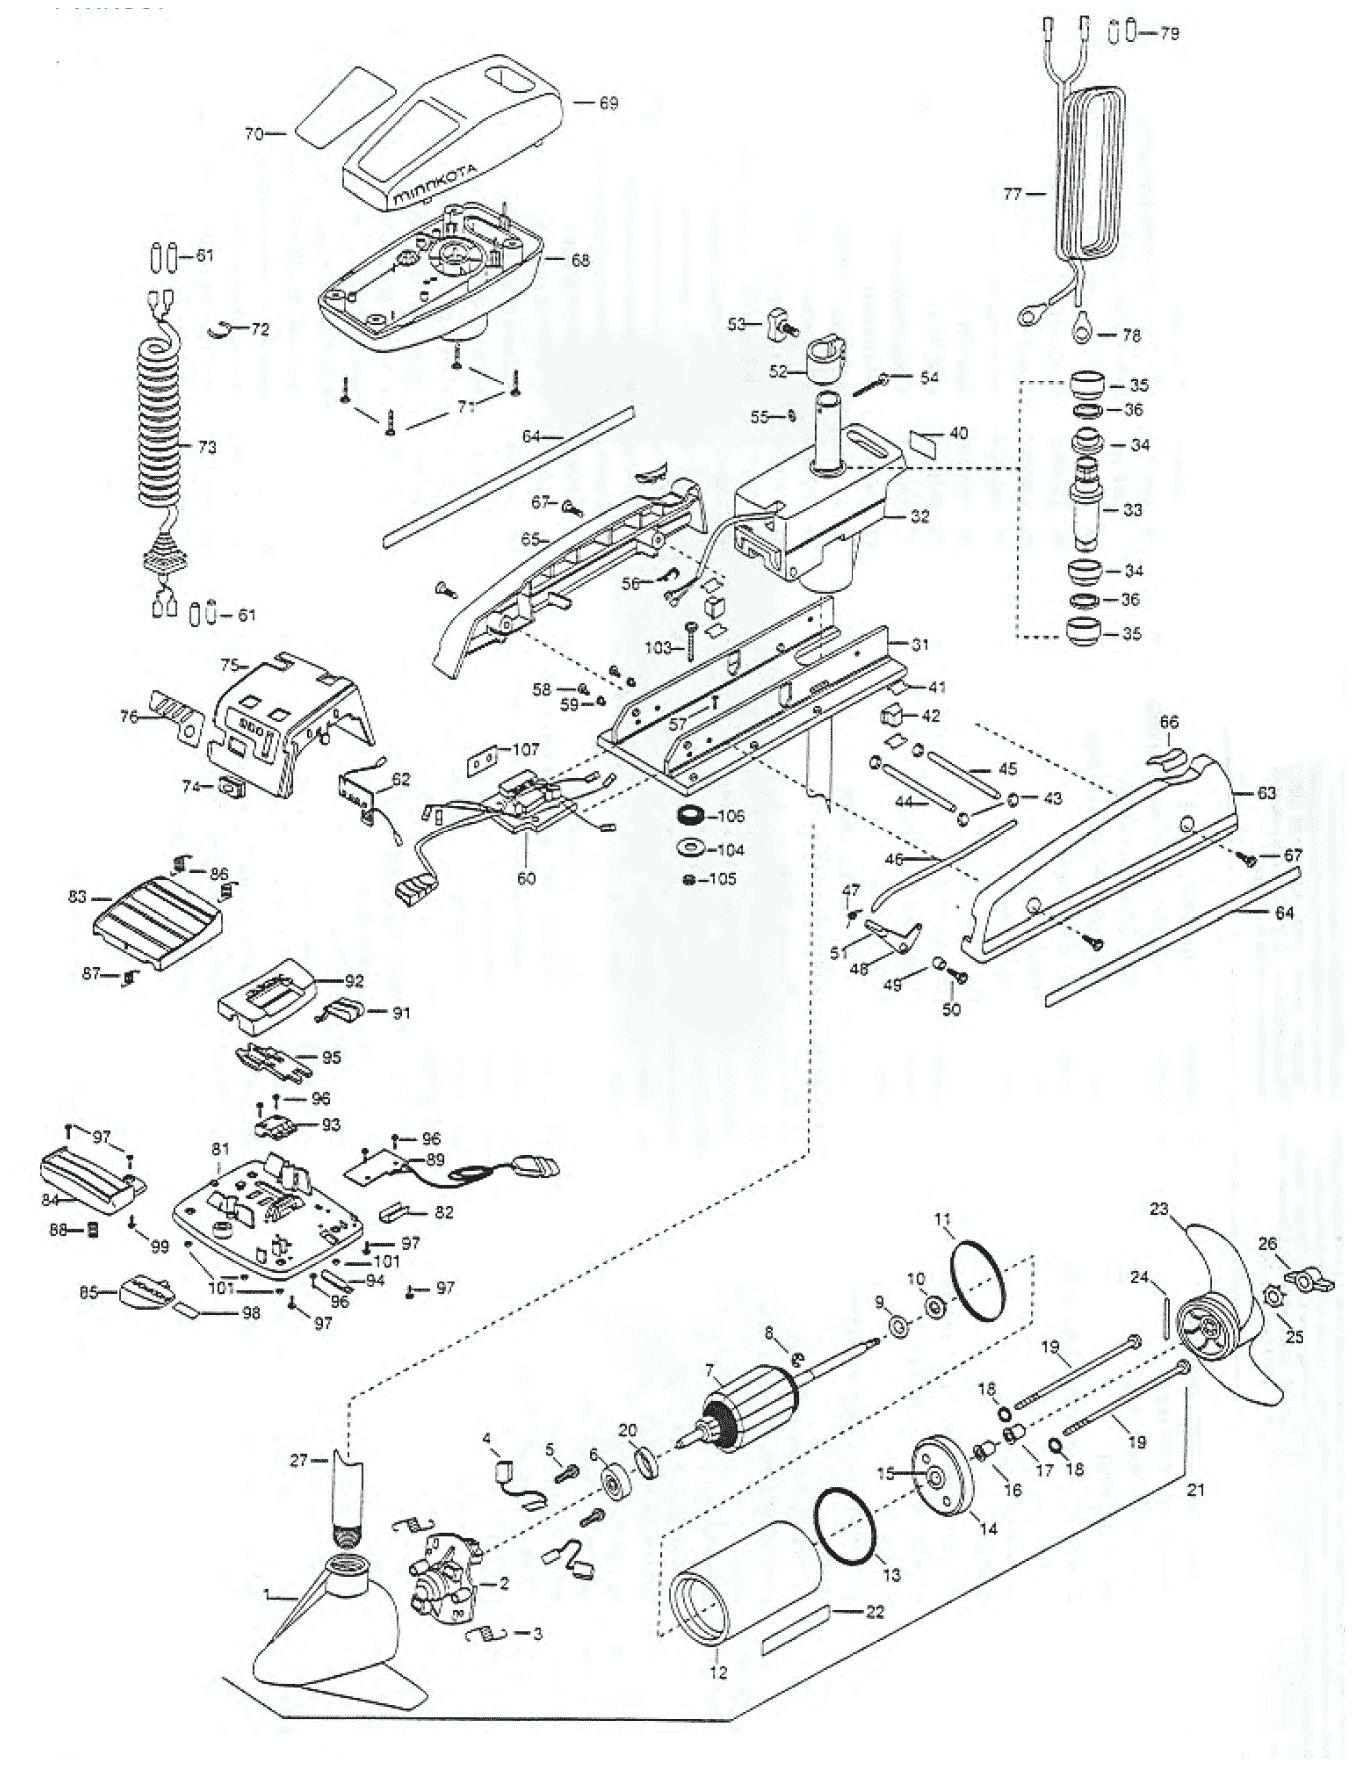 Minn Kota Trolling Motor Circuit Board Parts Motor Replacement Parts